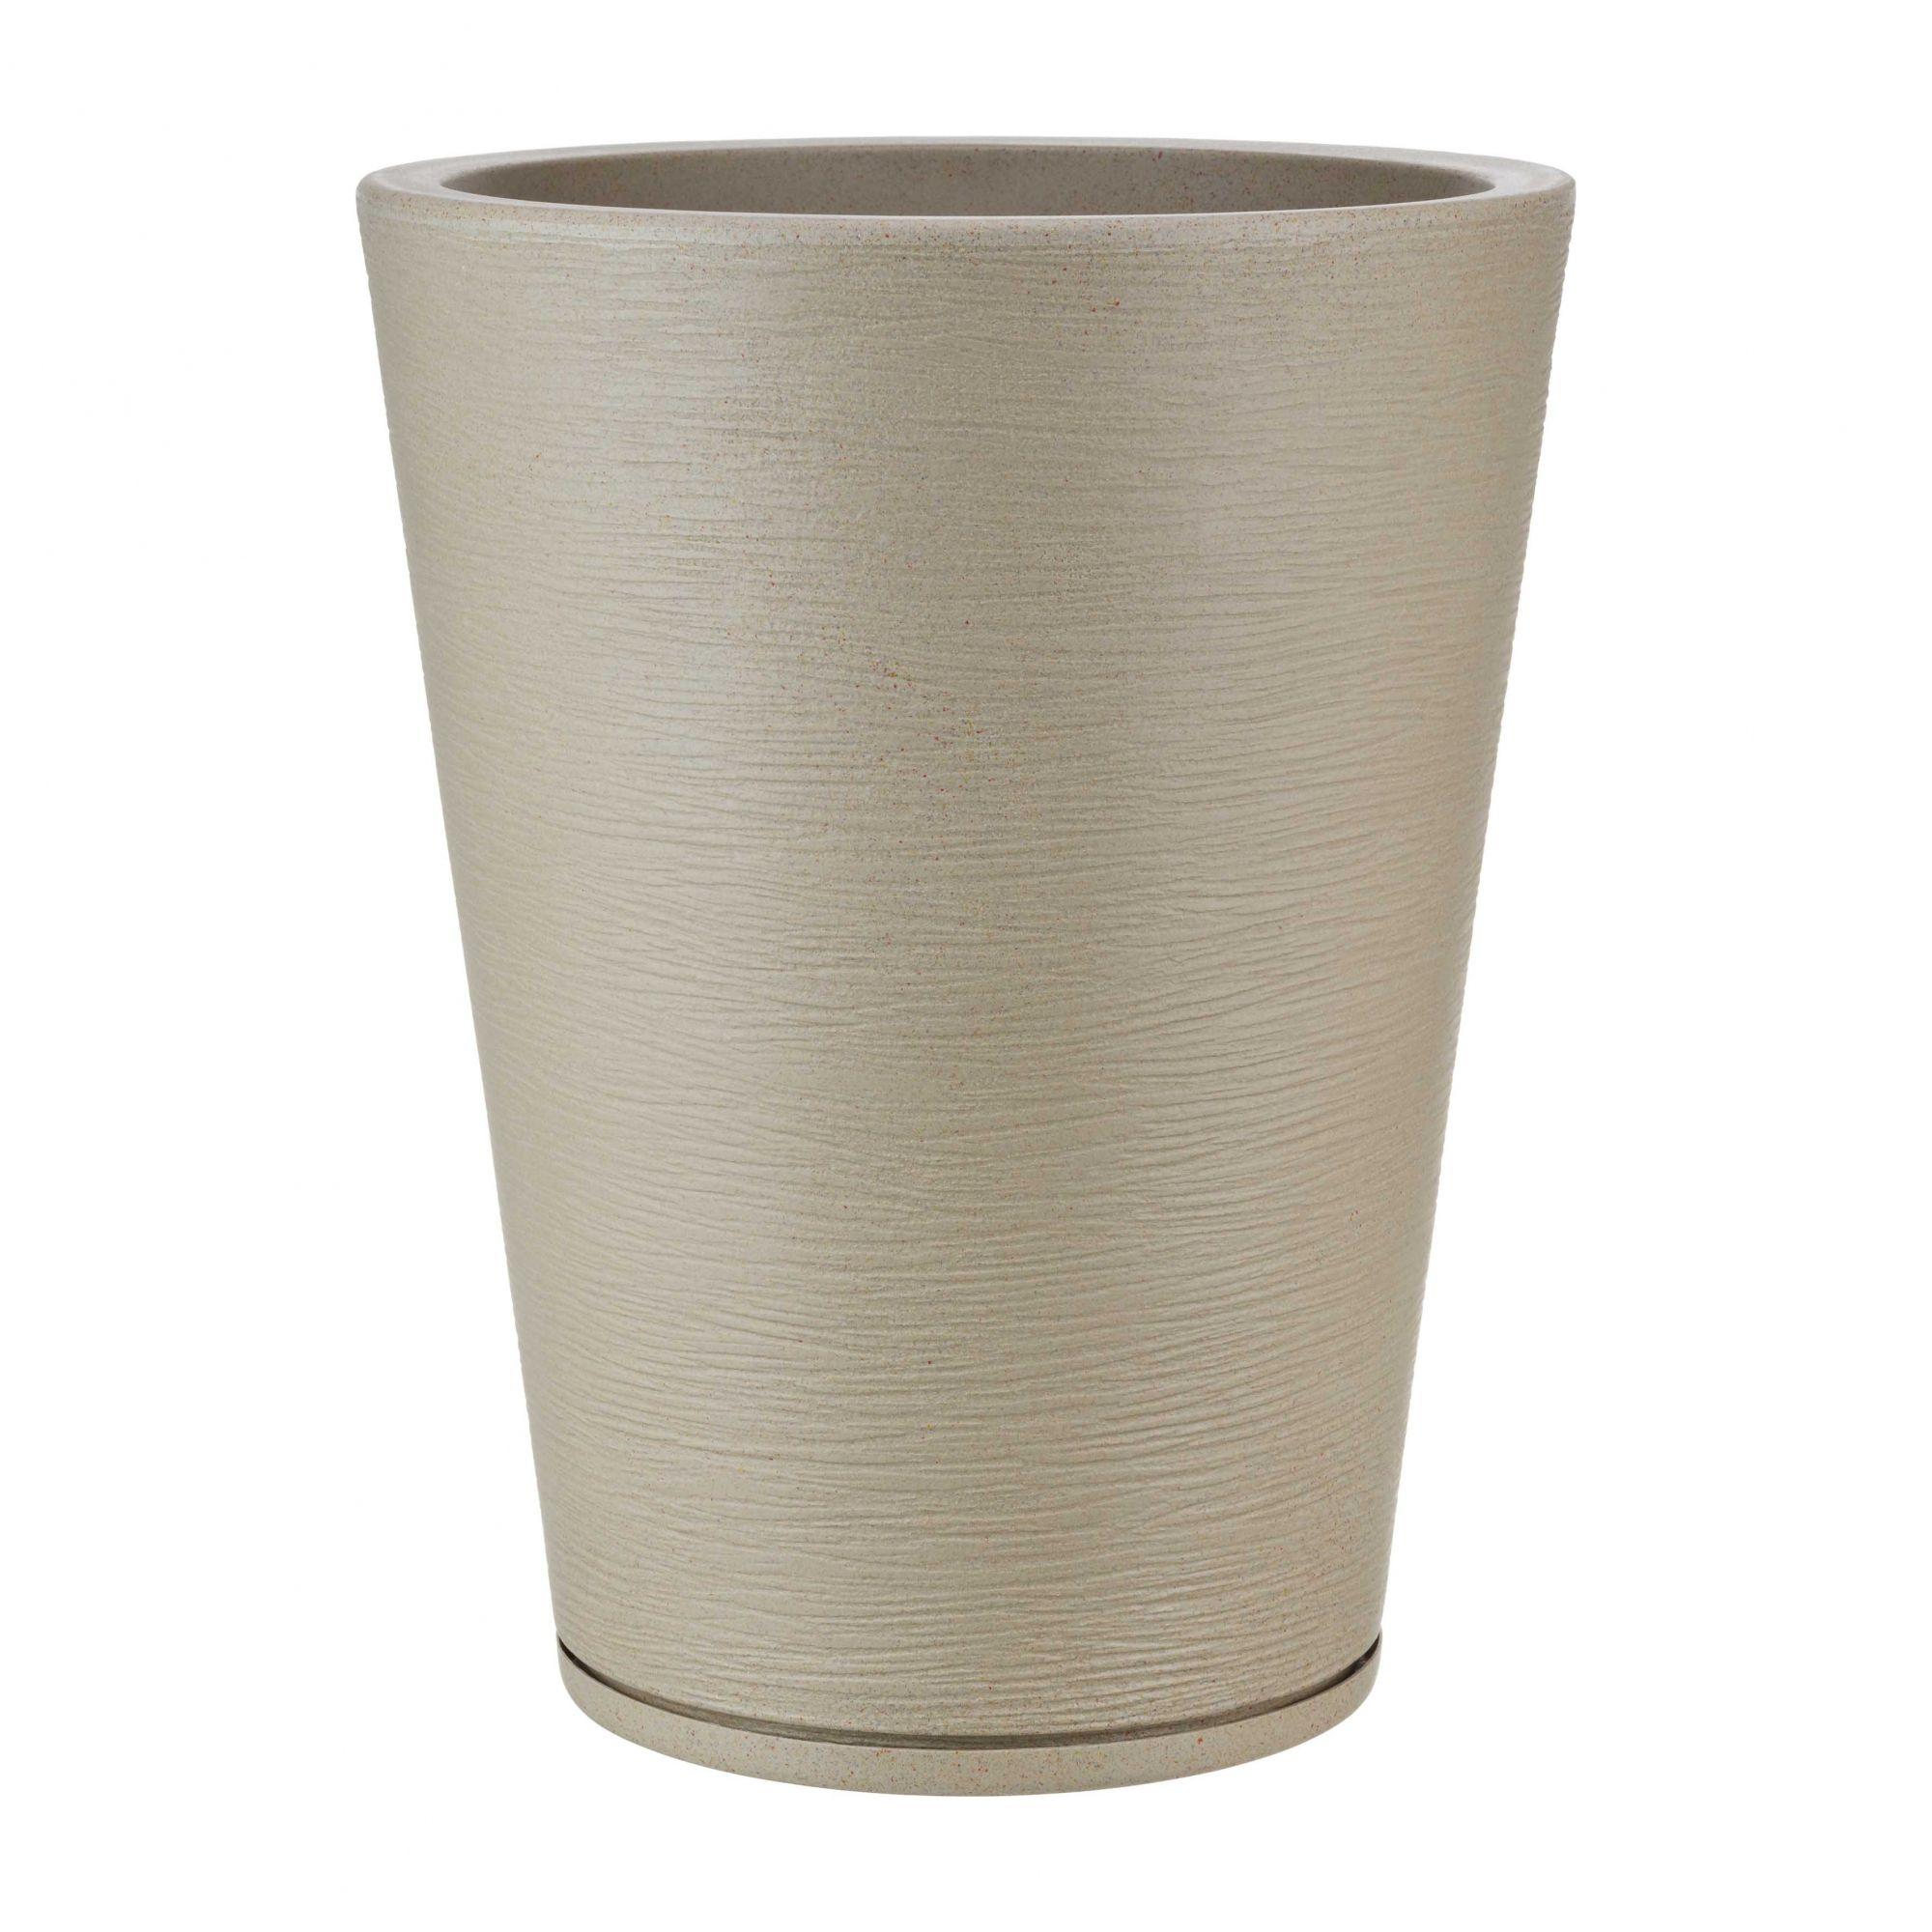 Vaso Genebra Grafiato Bege Stone - 38 x 57 cm